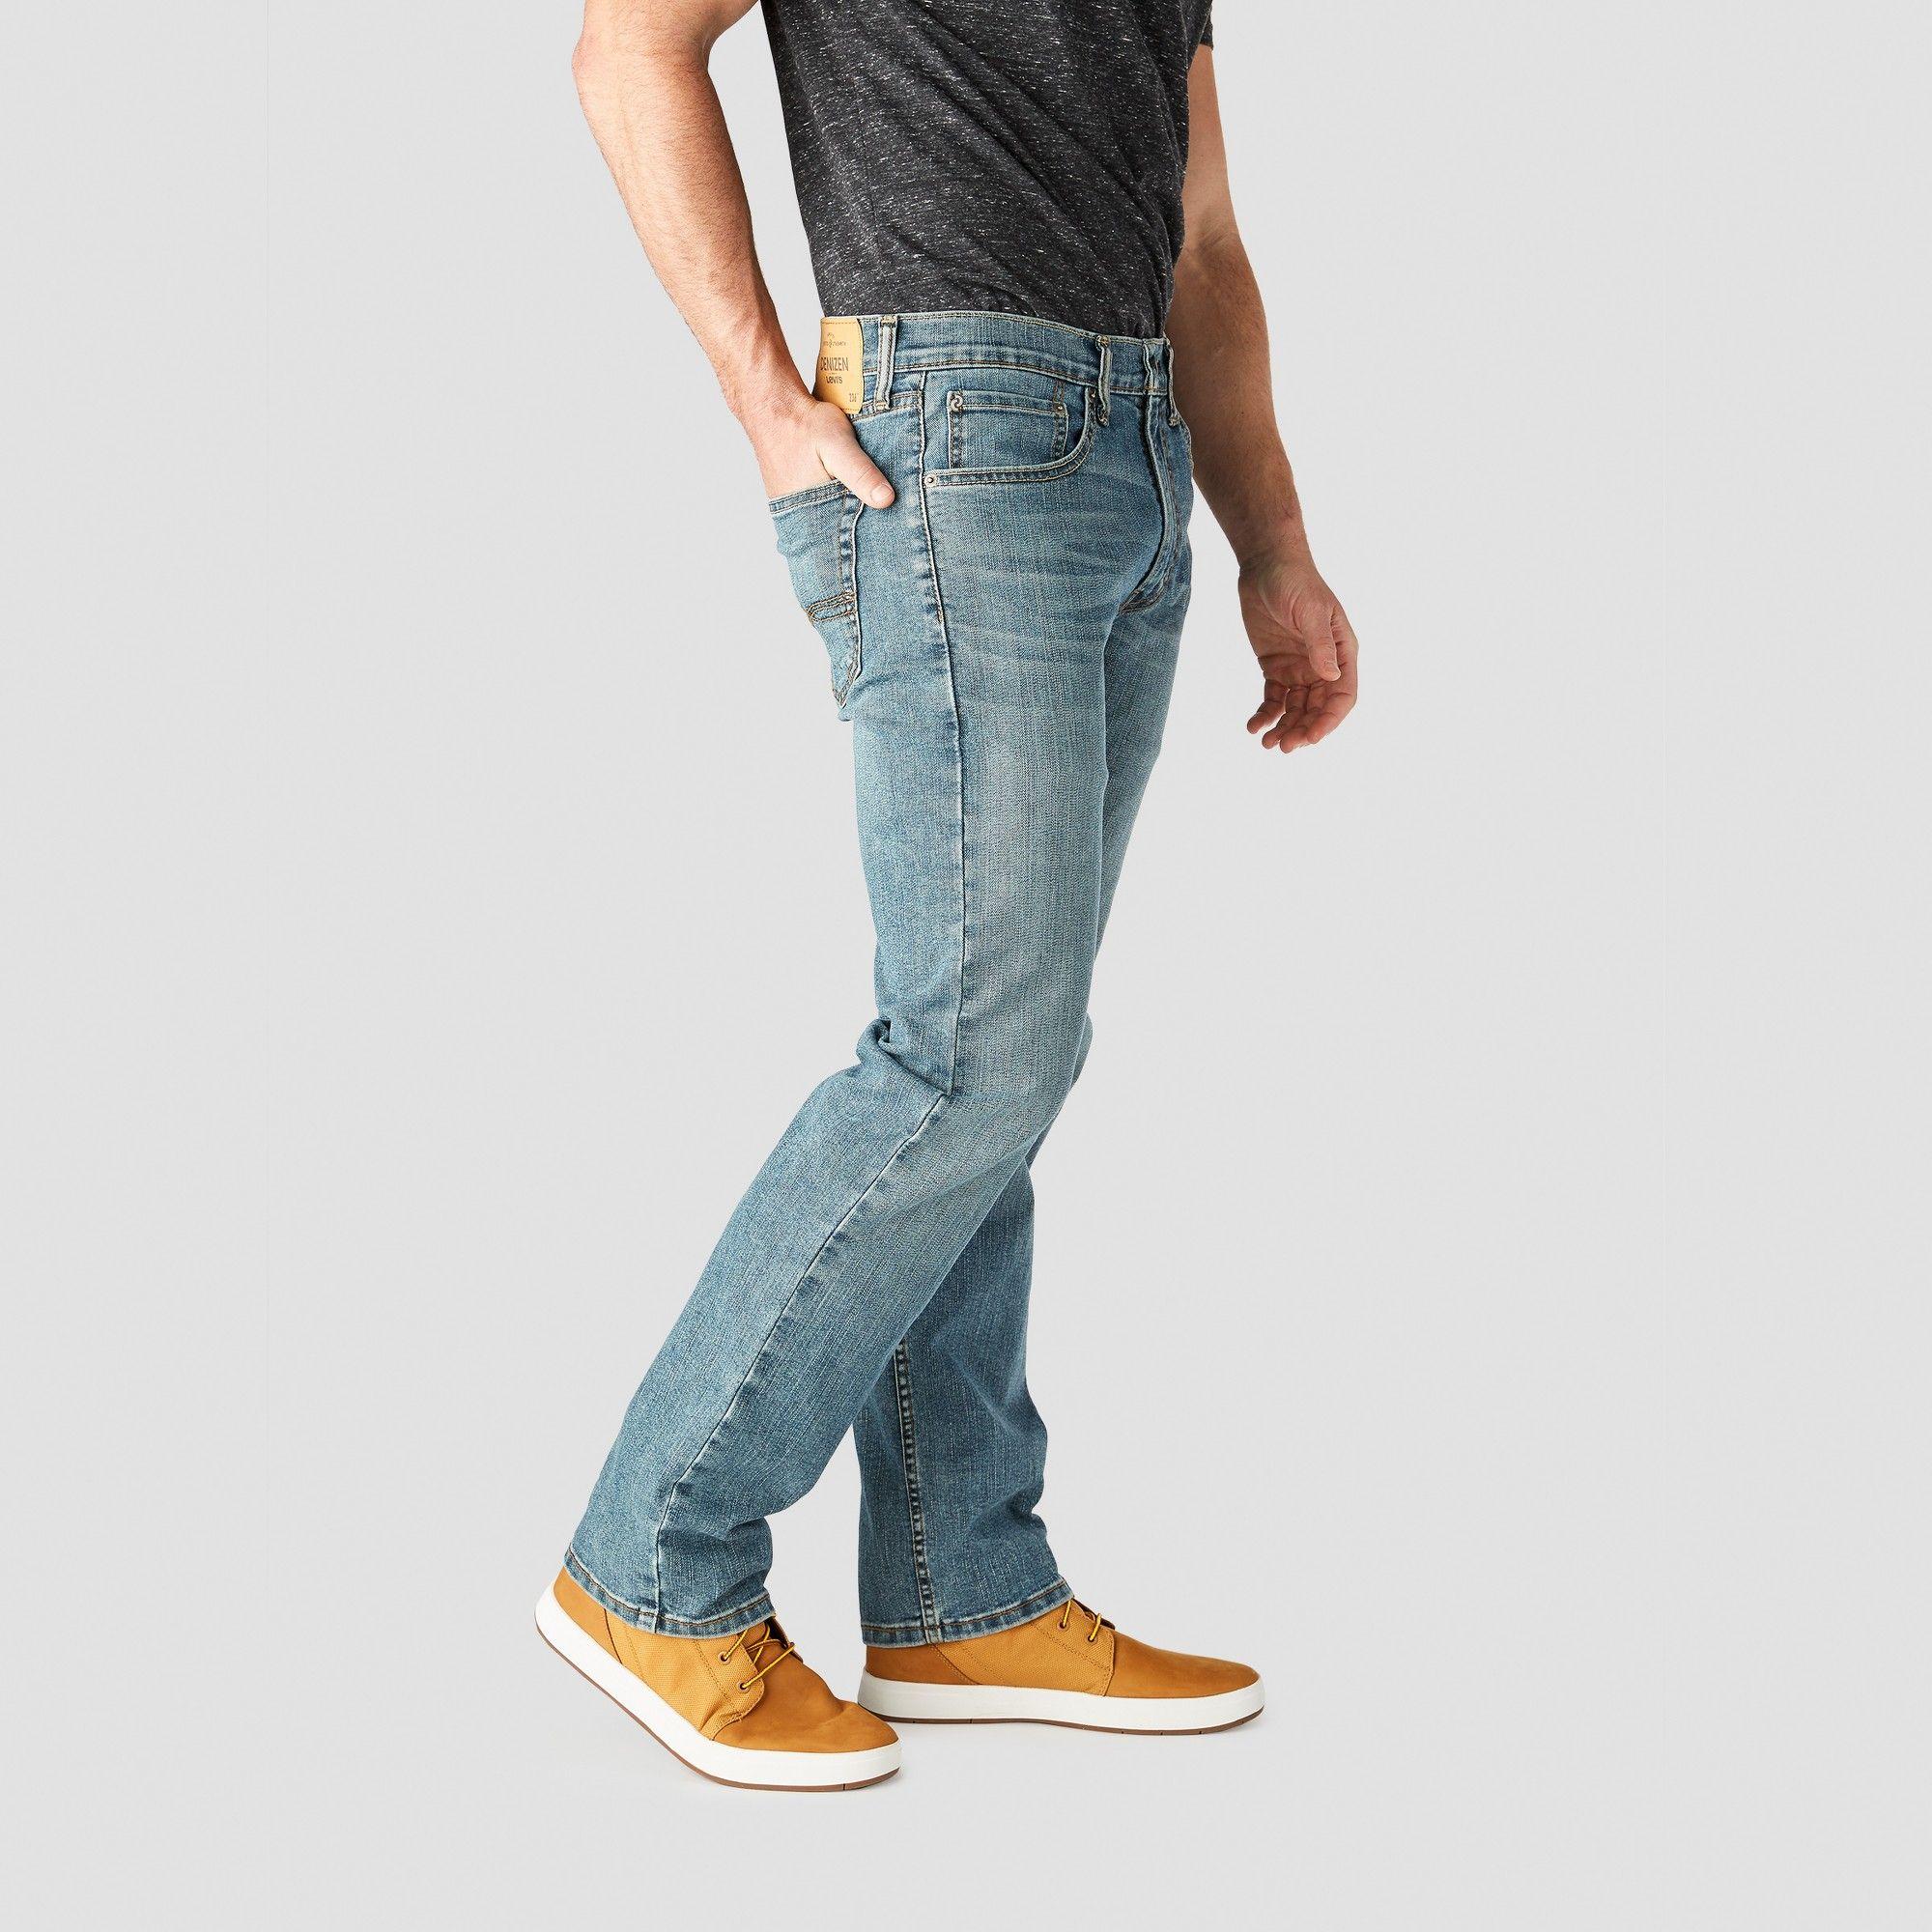 9d9ef9f43d10 Denizen from Levi s Men s 236 Regular Straight Fit Jeans - Medium Wash  38x30